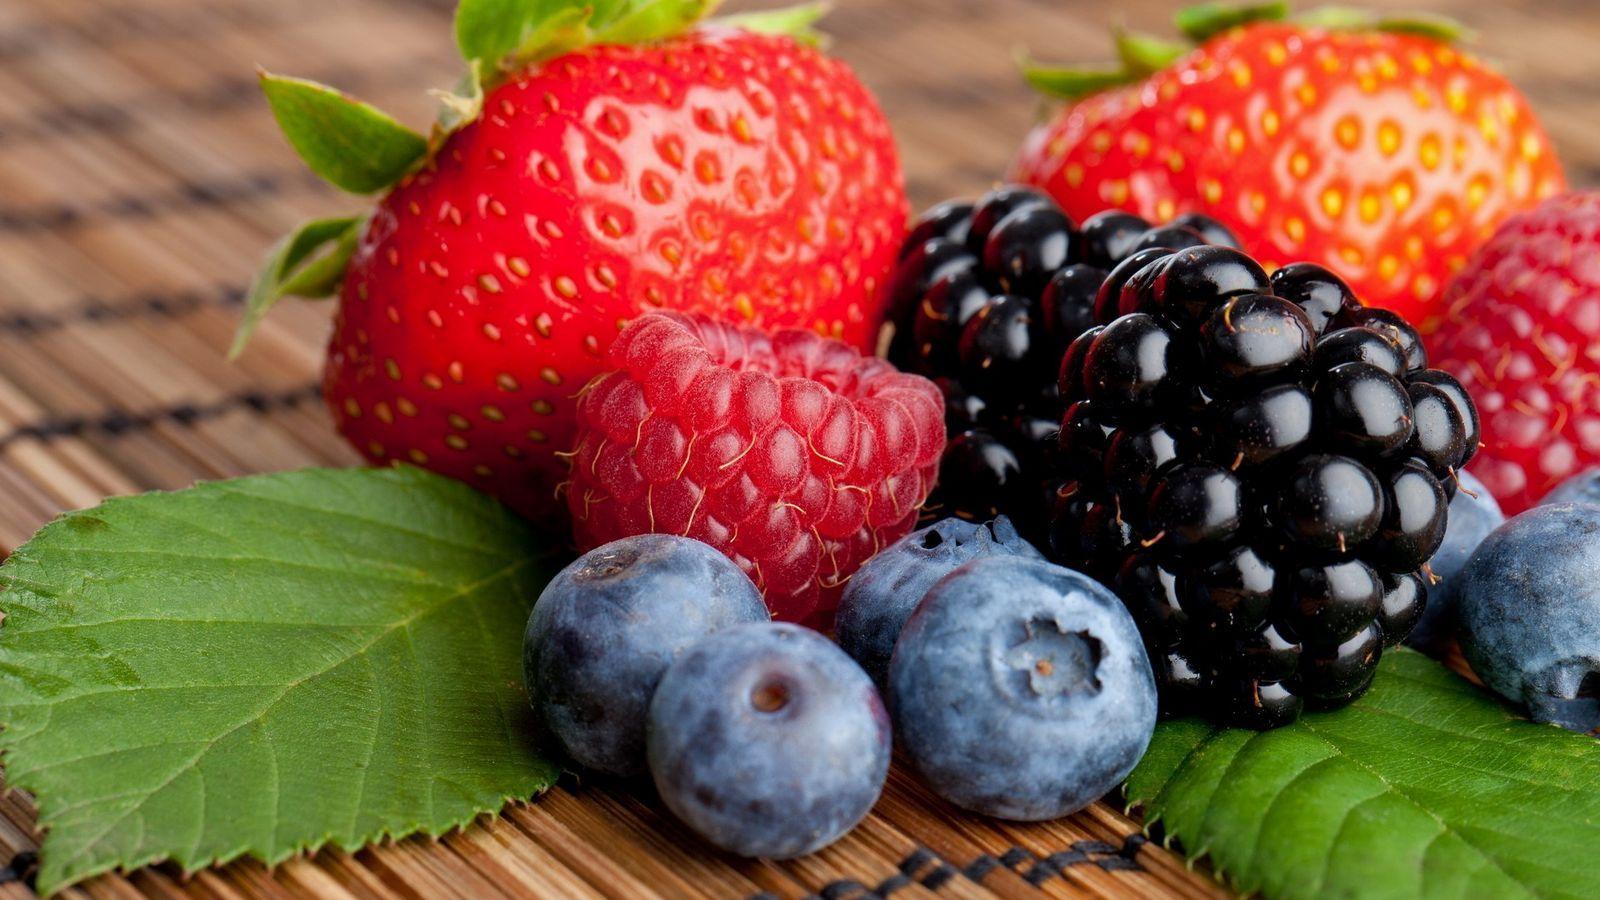 Blackberry fruit wallpaper - Wonderful Different Sweet Fruits Hd Wallpapers